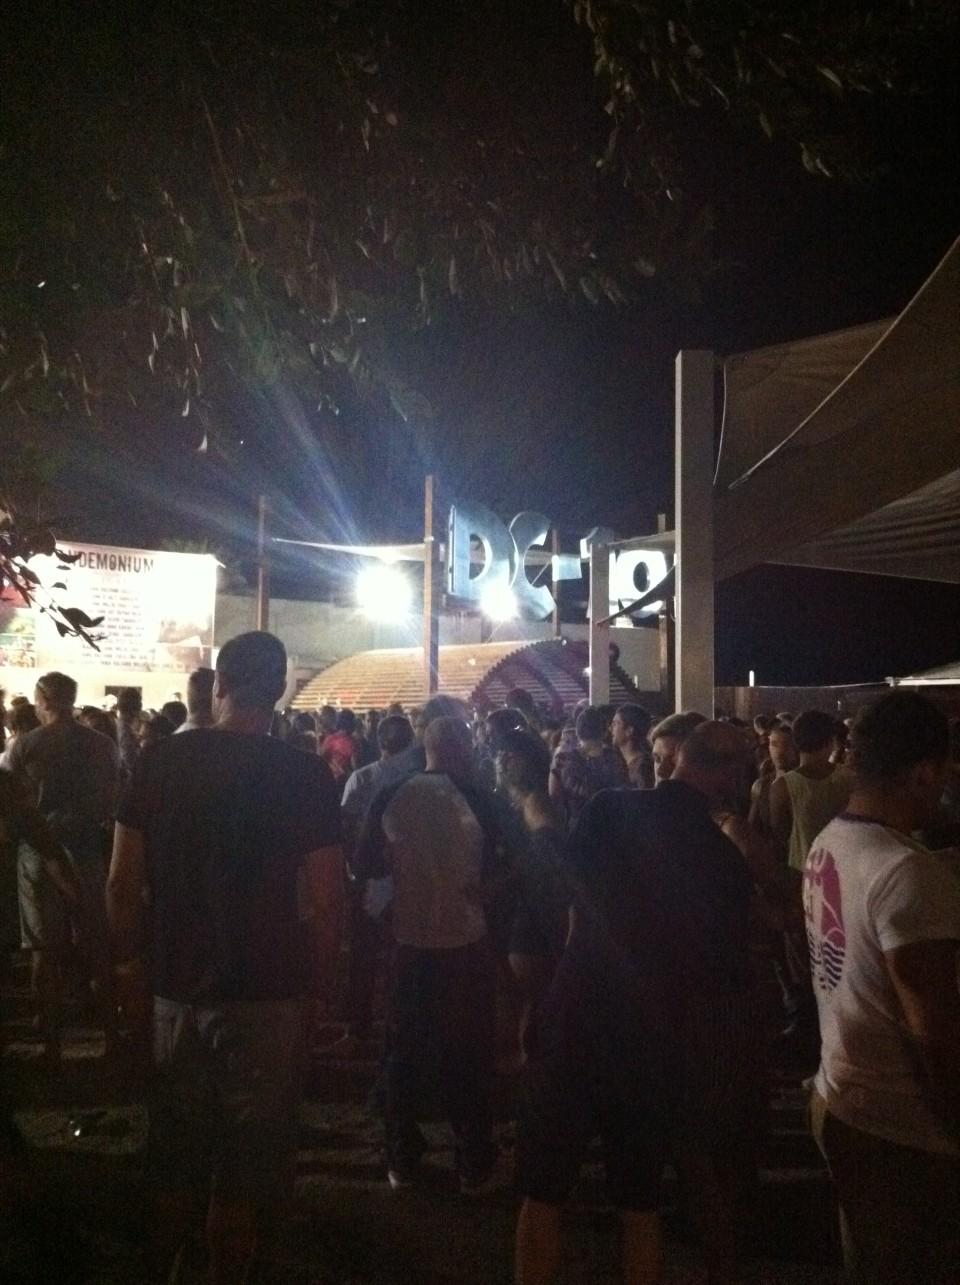 DC 10, Ibiza